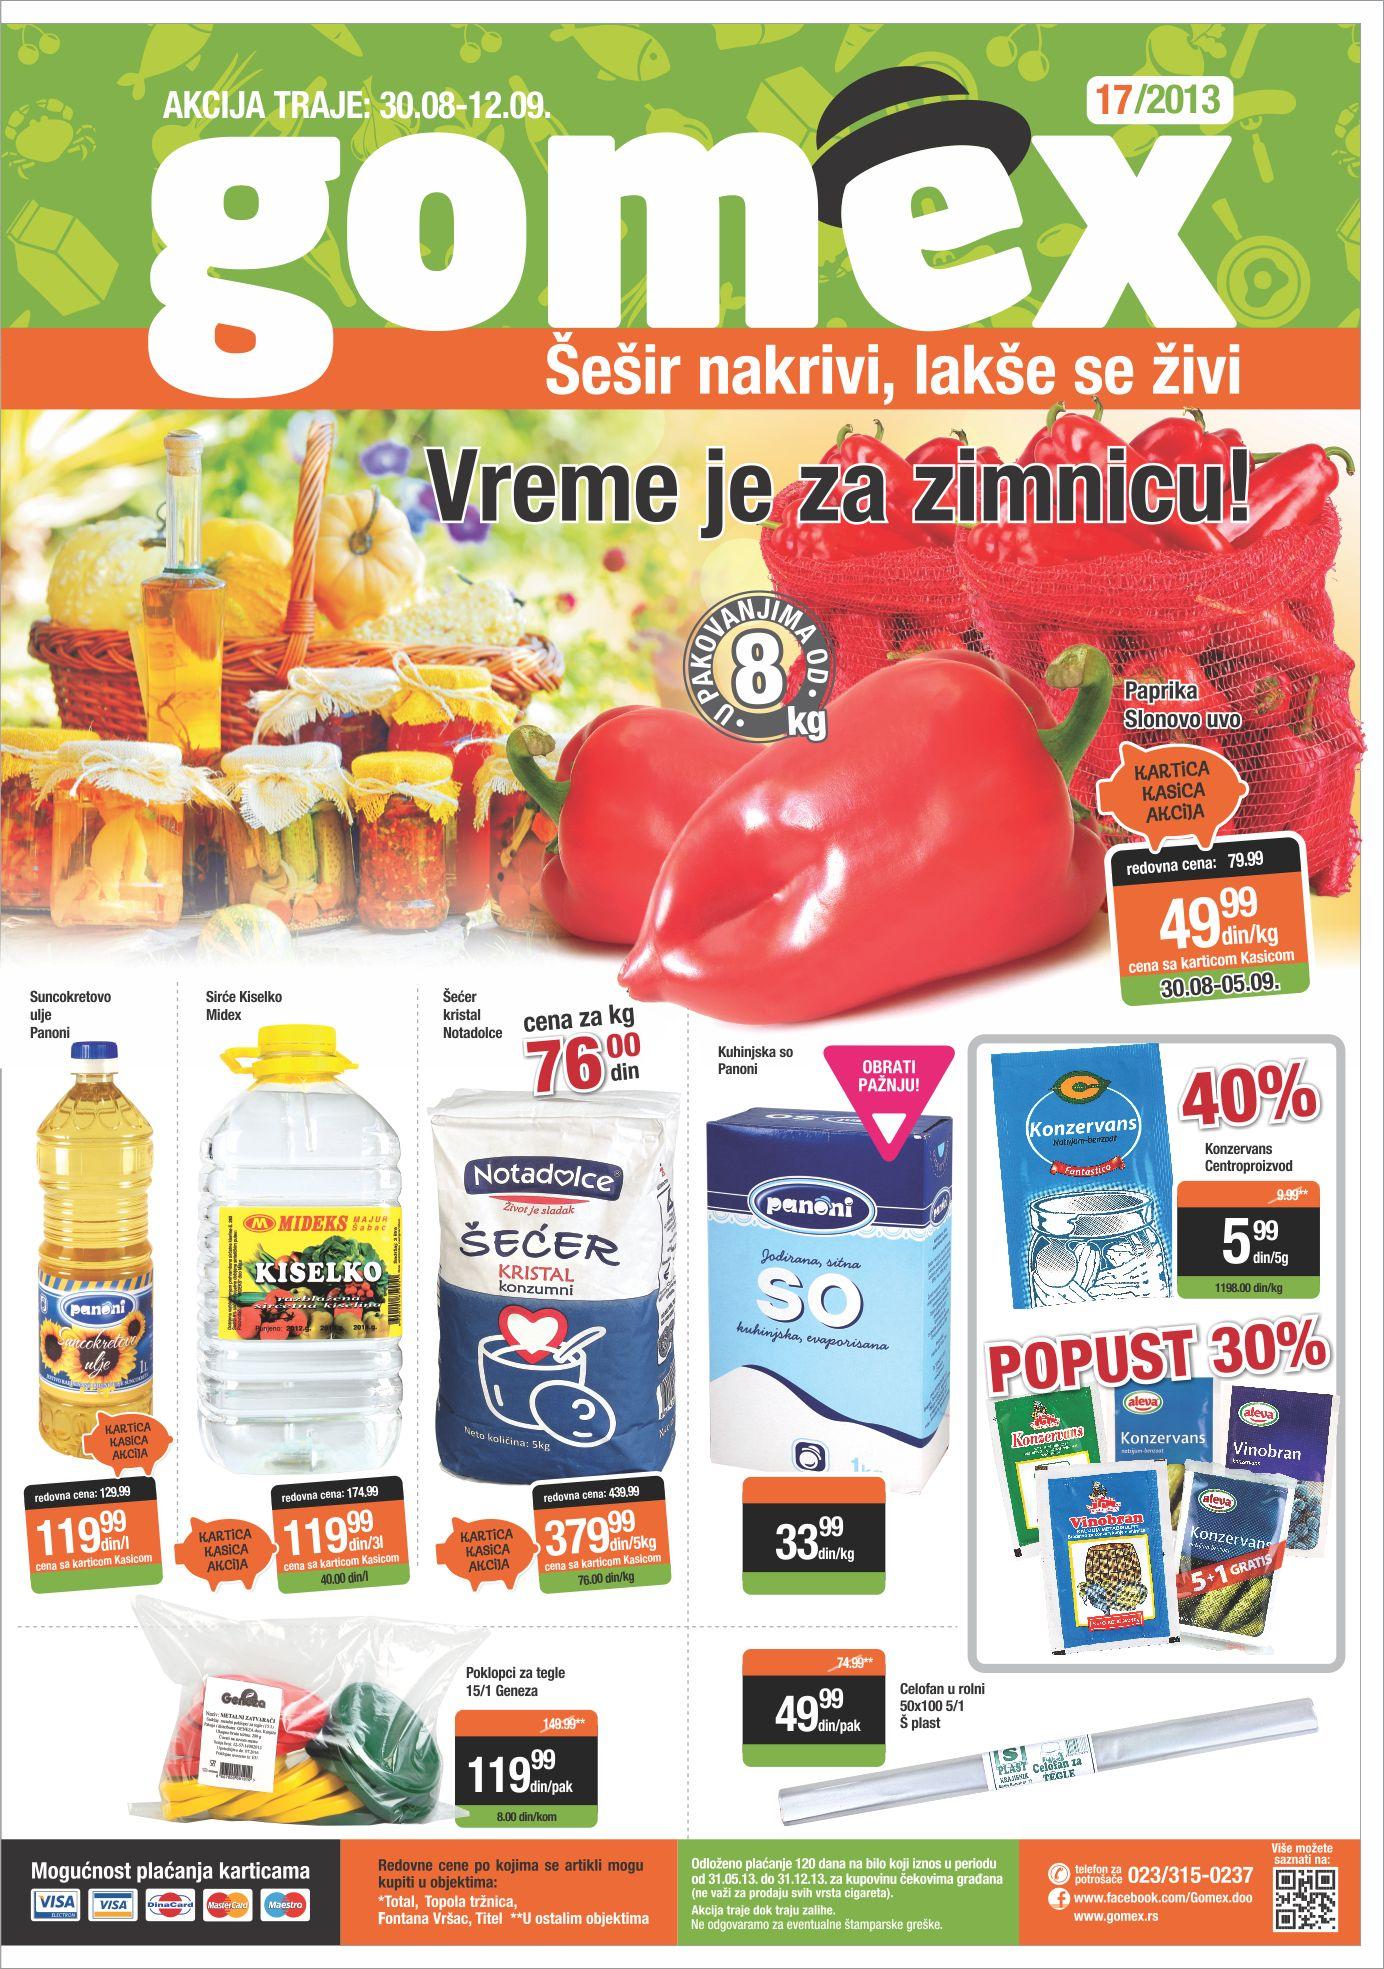 Gomex katalog super ponude